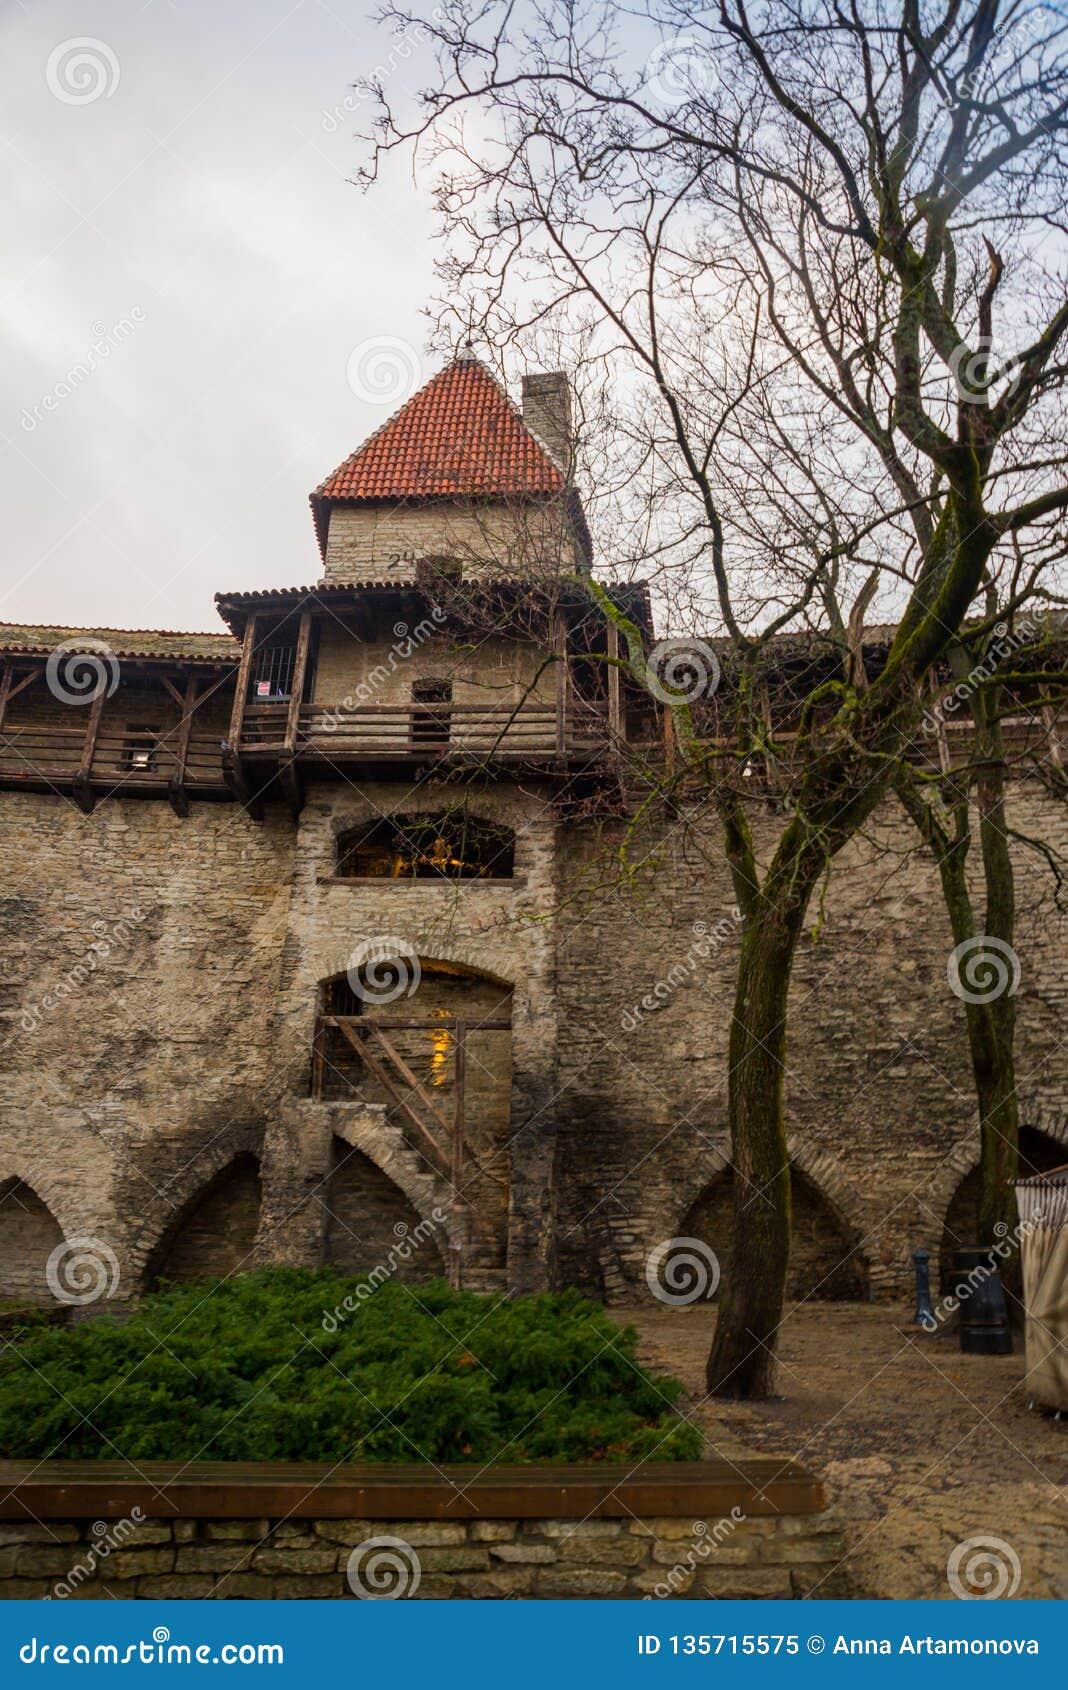 La torre anterior Neitsitorn de la prisión en Tallinn vieja, Estonia Torre virginal